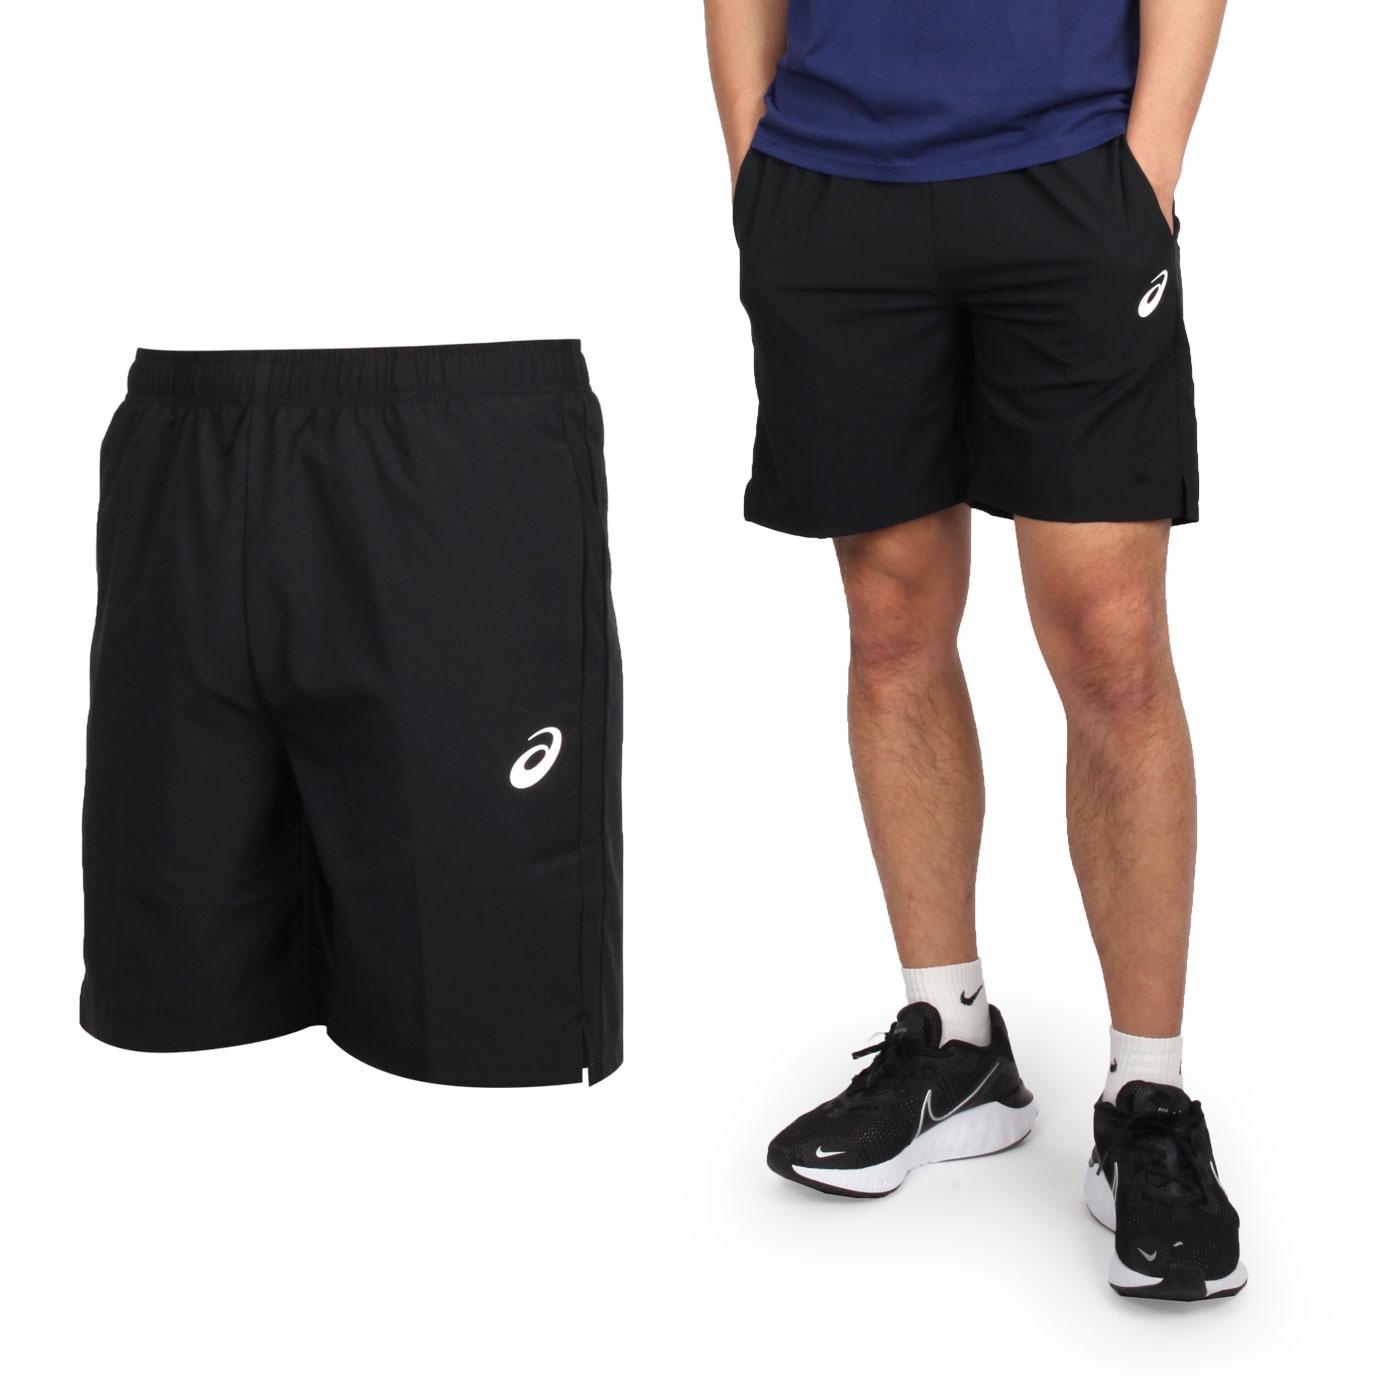 ASICS 男款平織短褲 K12050-90 - 黑白